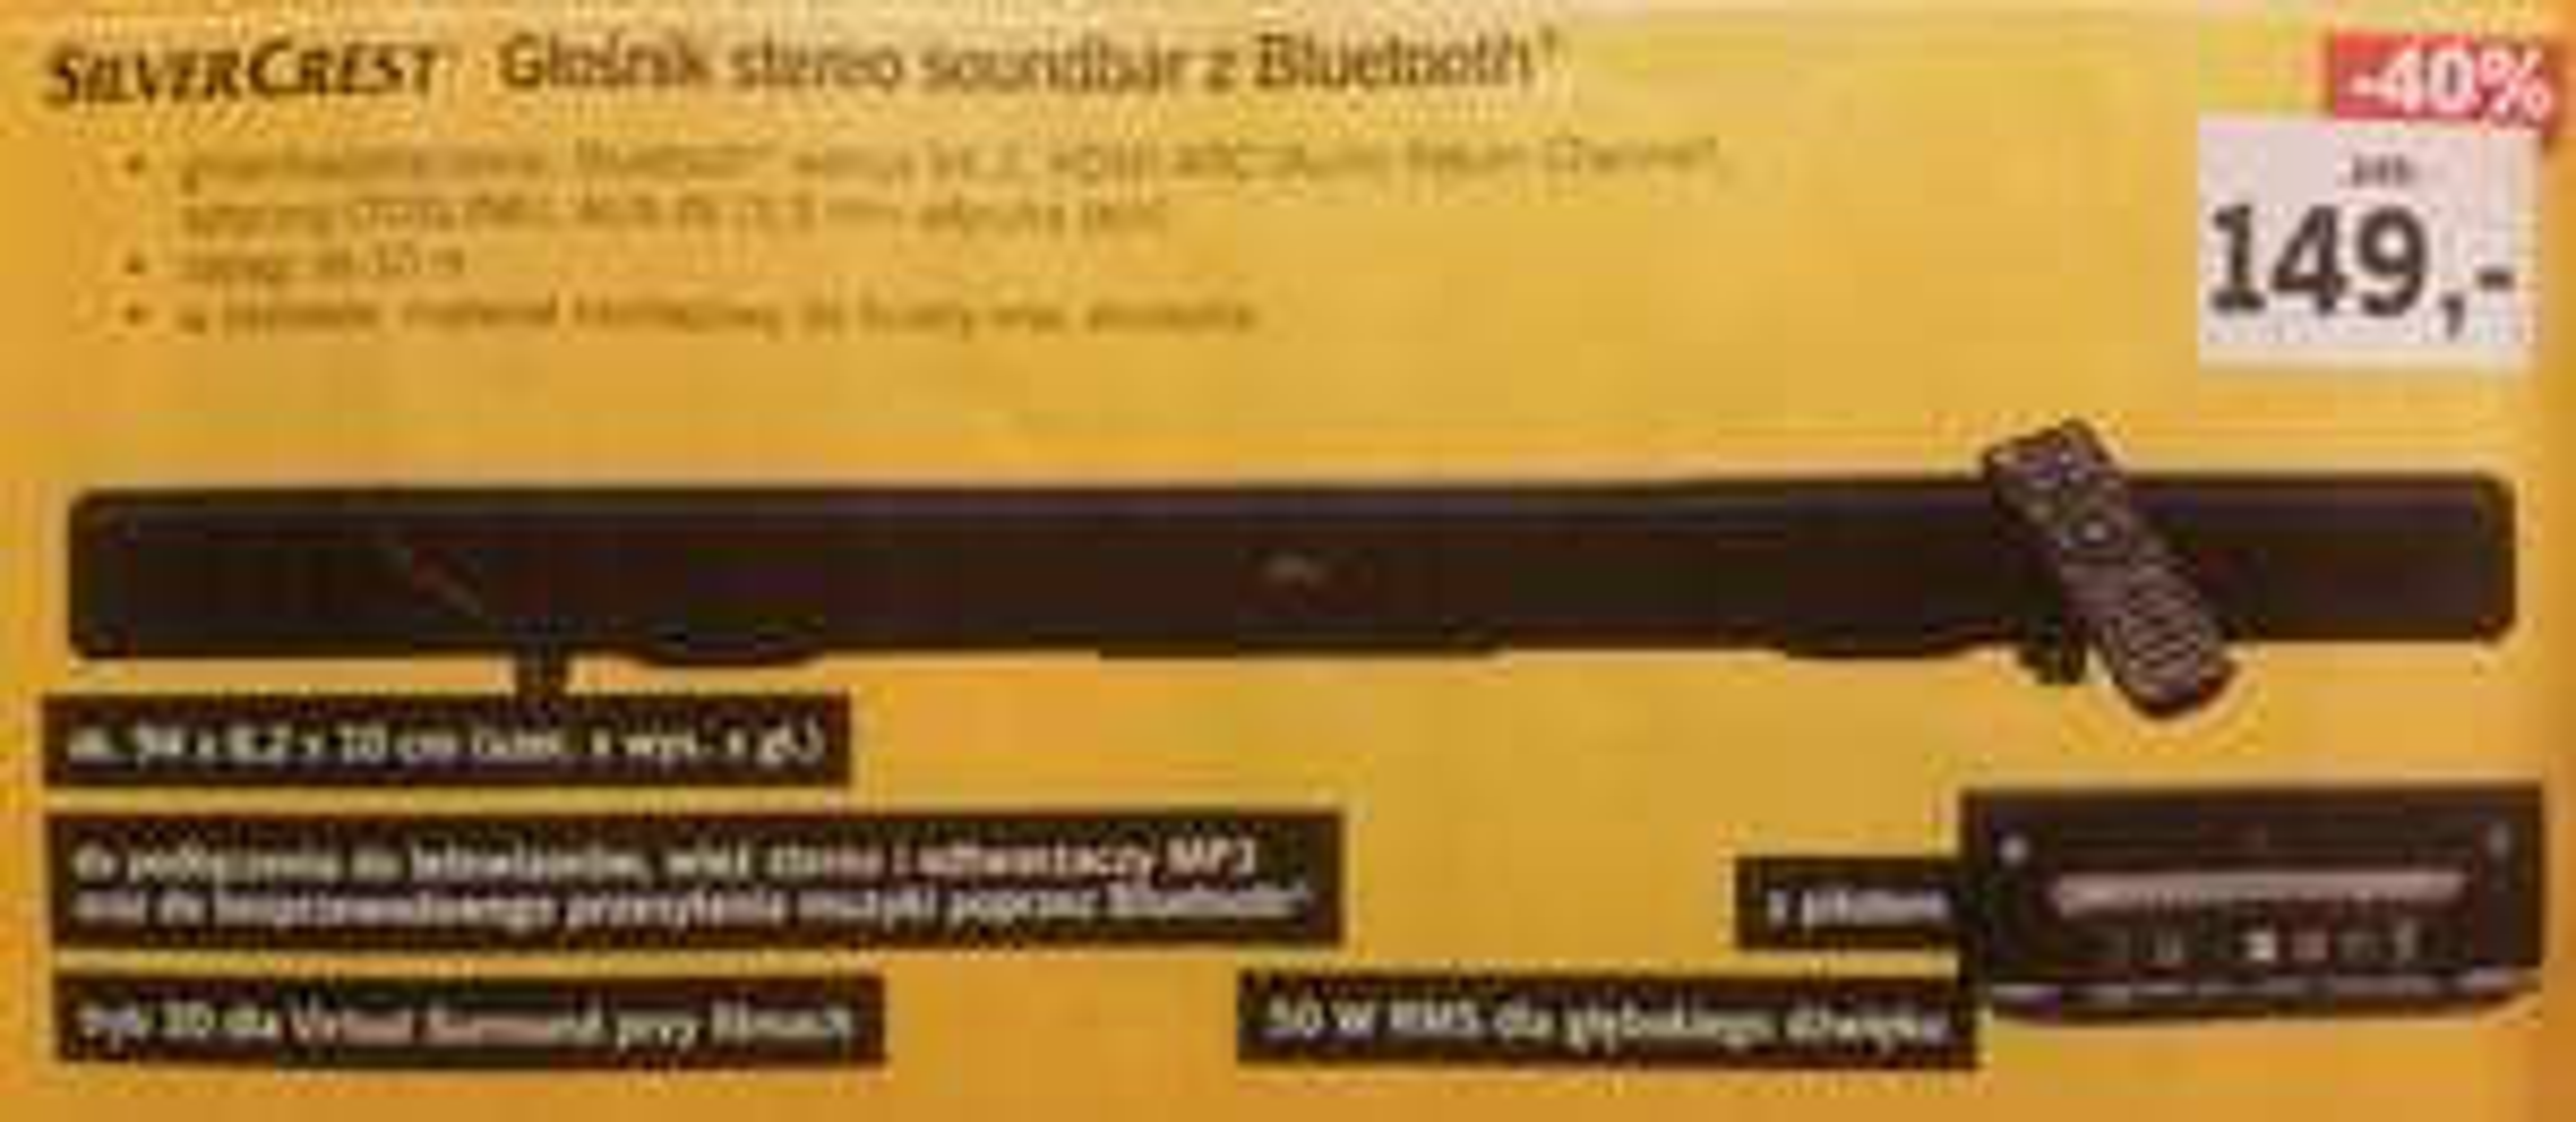 Glosnik. Soundbar z Bluetooth. SilverCrest. Lidl